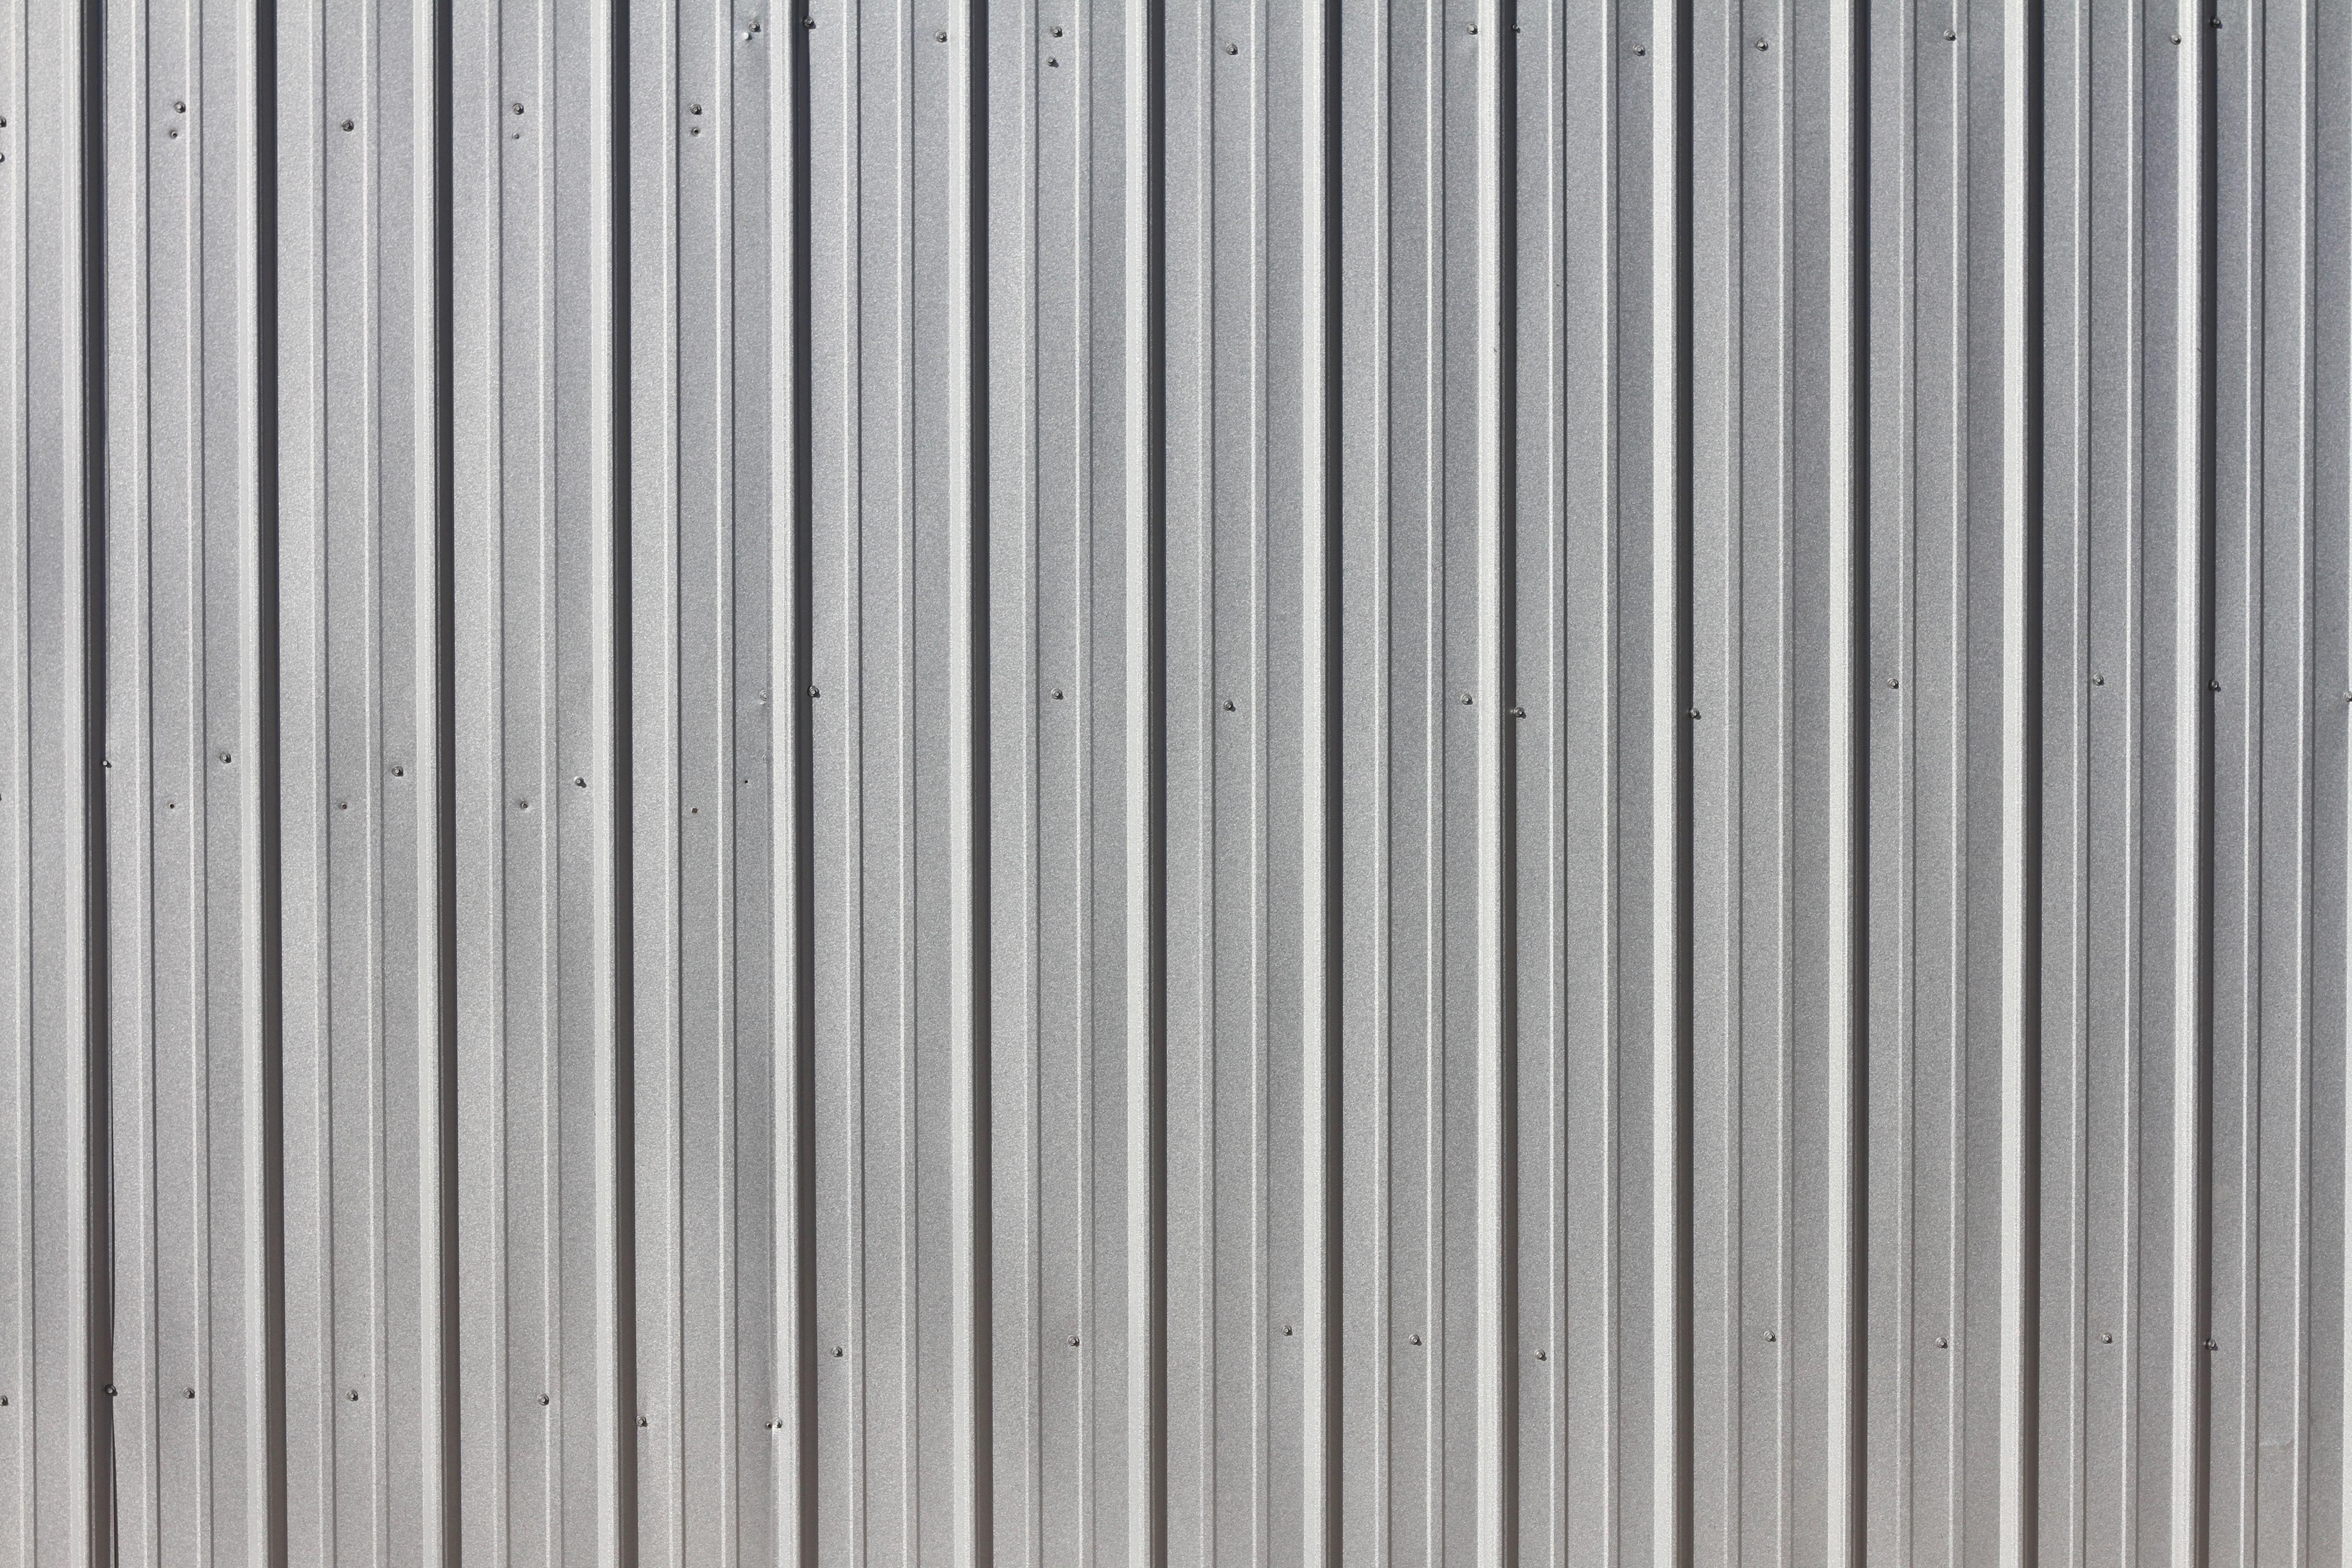 Images about corrugated metal on pinterest - Corrugated Metal Panel Texture Design Decorating 824162 Floor Ideas Design